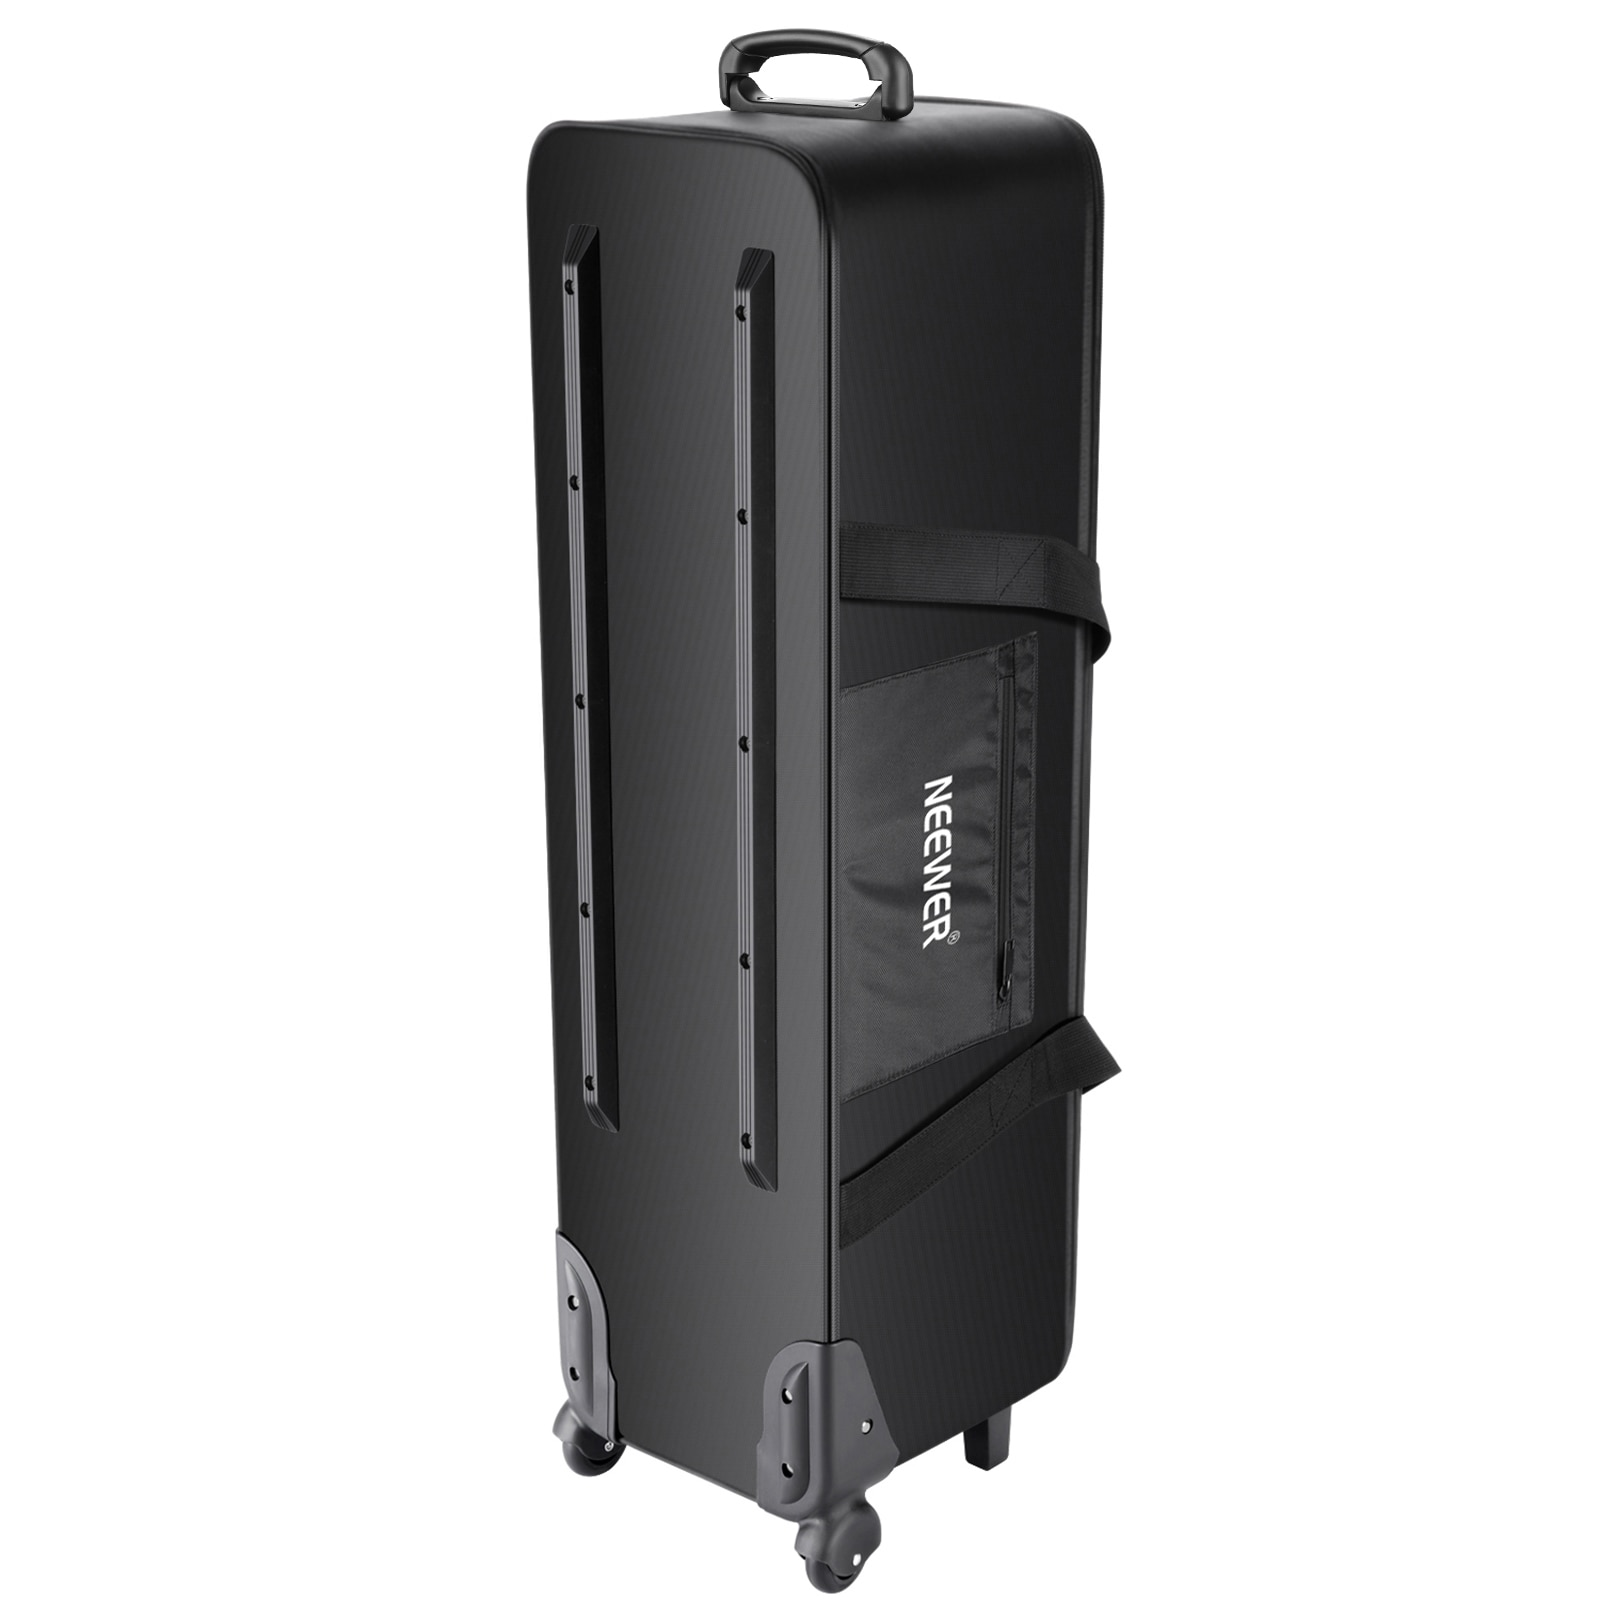 Neewer صور استوديو معدات المتداول حقيبة عربة حمل ل ضوء حامل ترايبود ضوء إحترافي